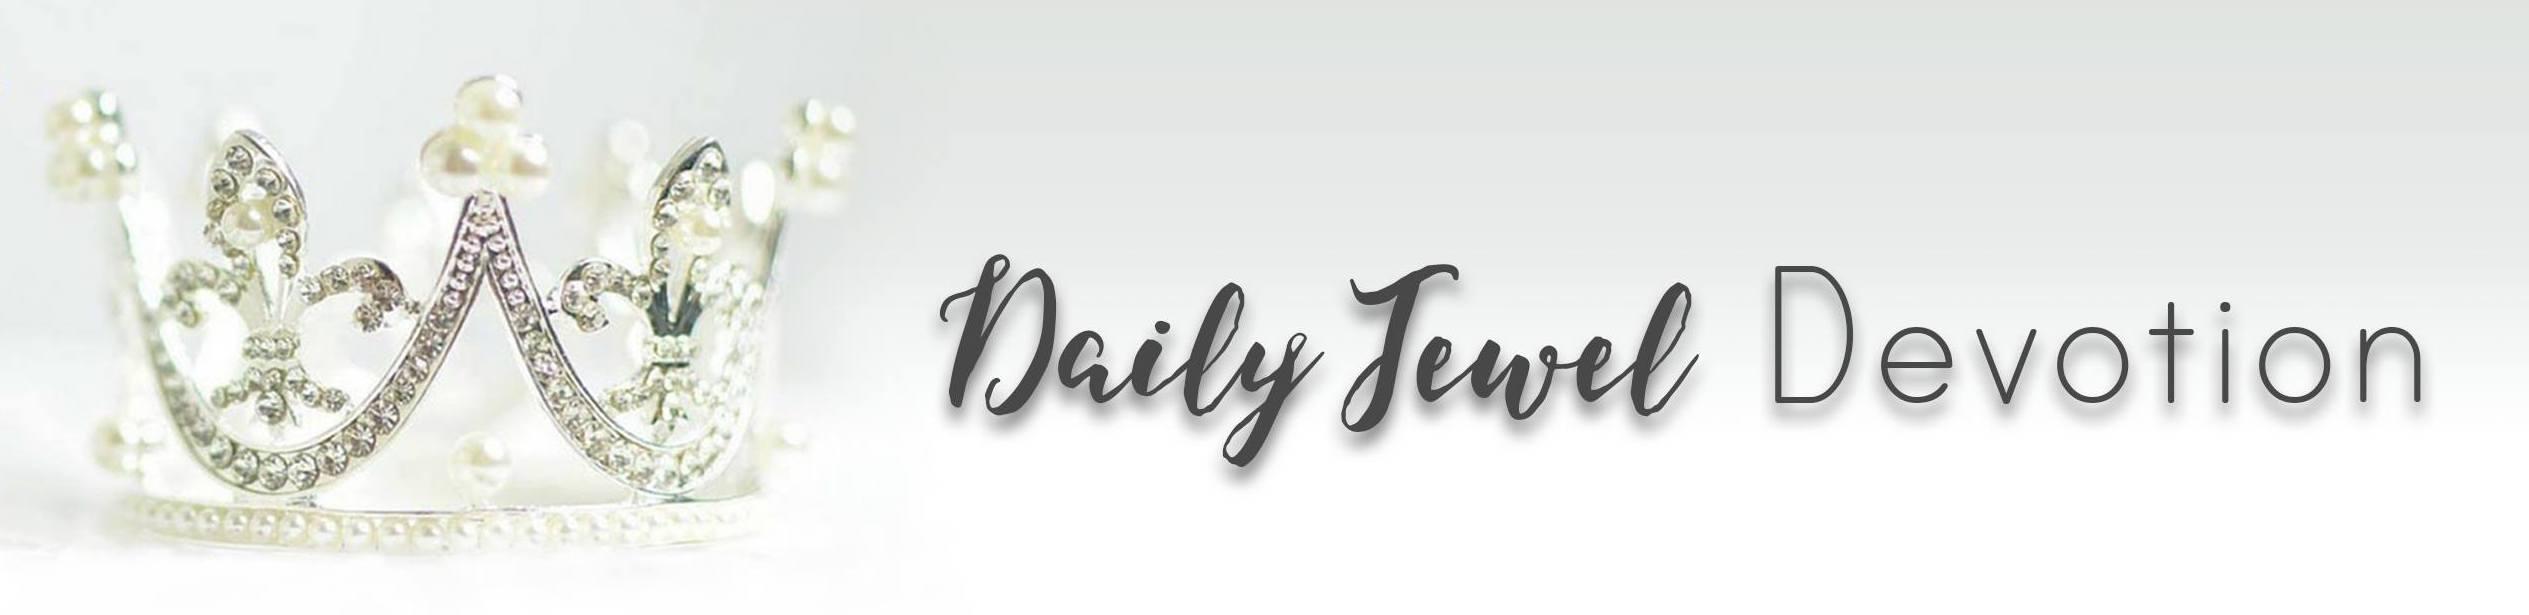 daily jewel devotion header